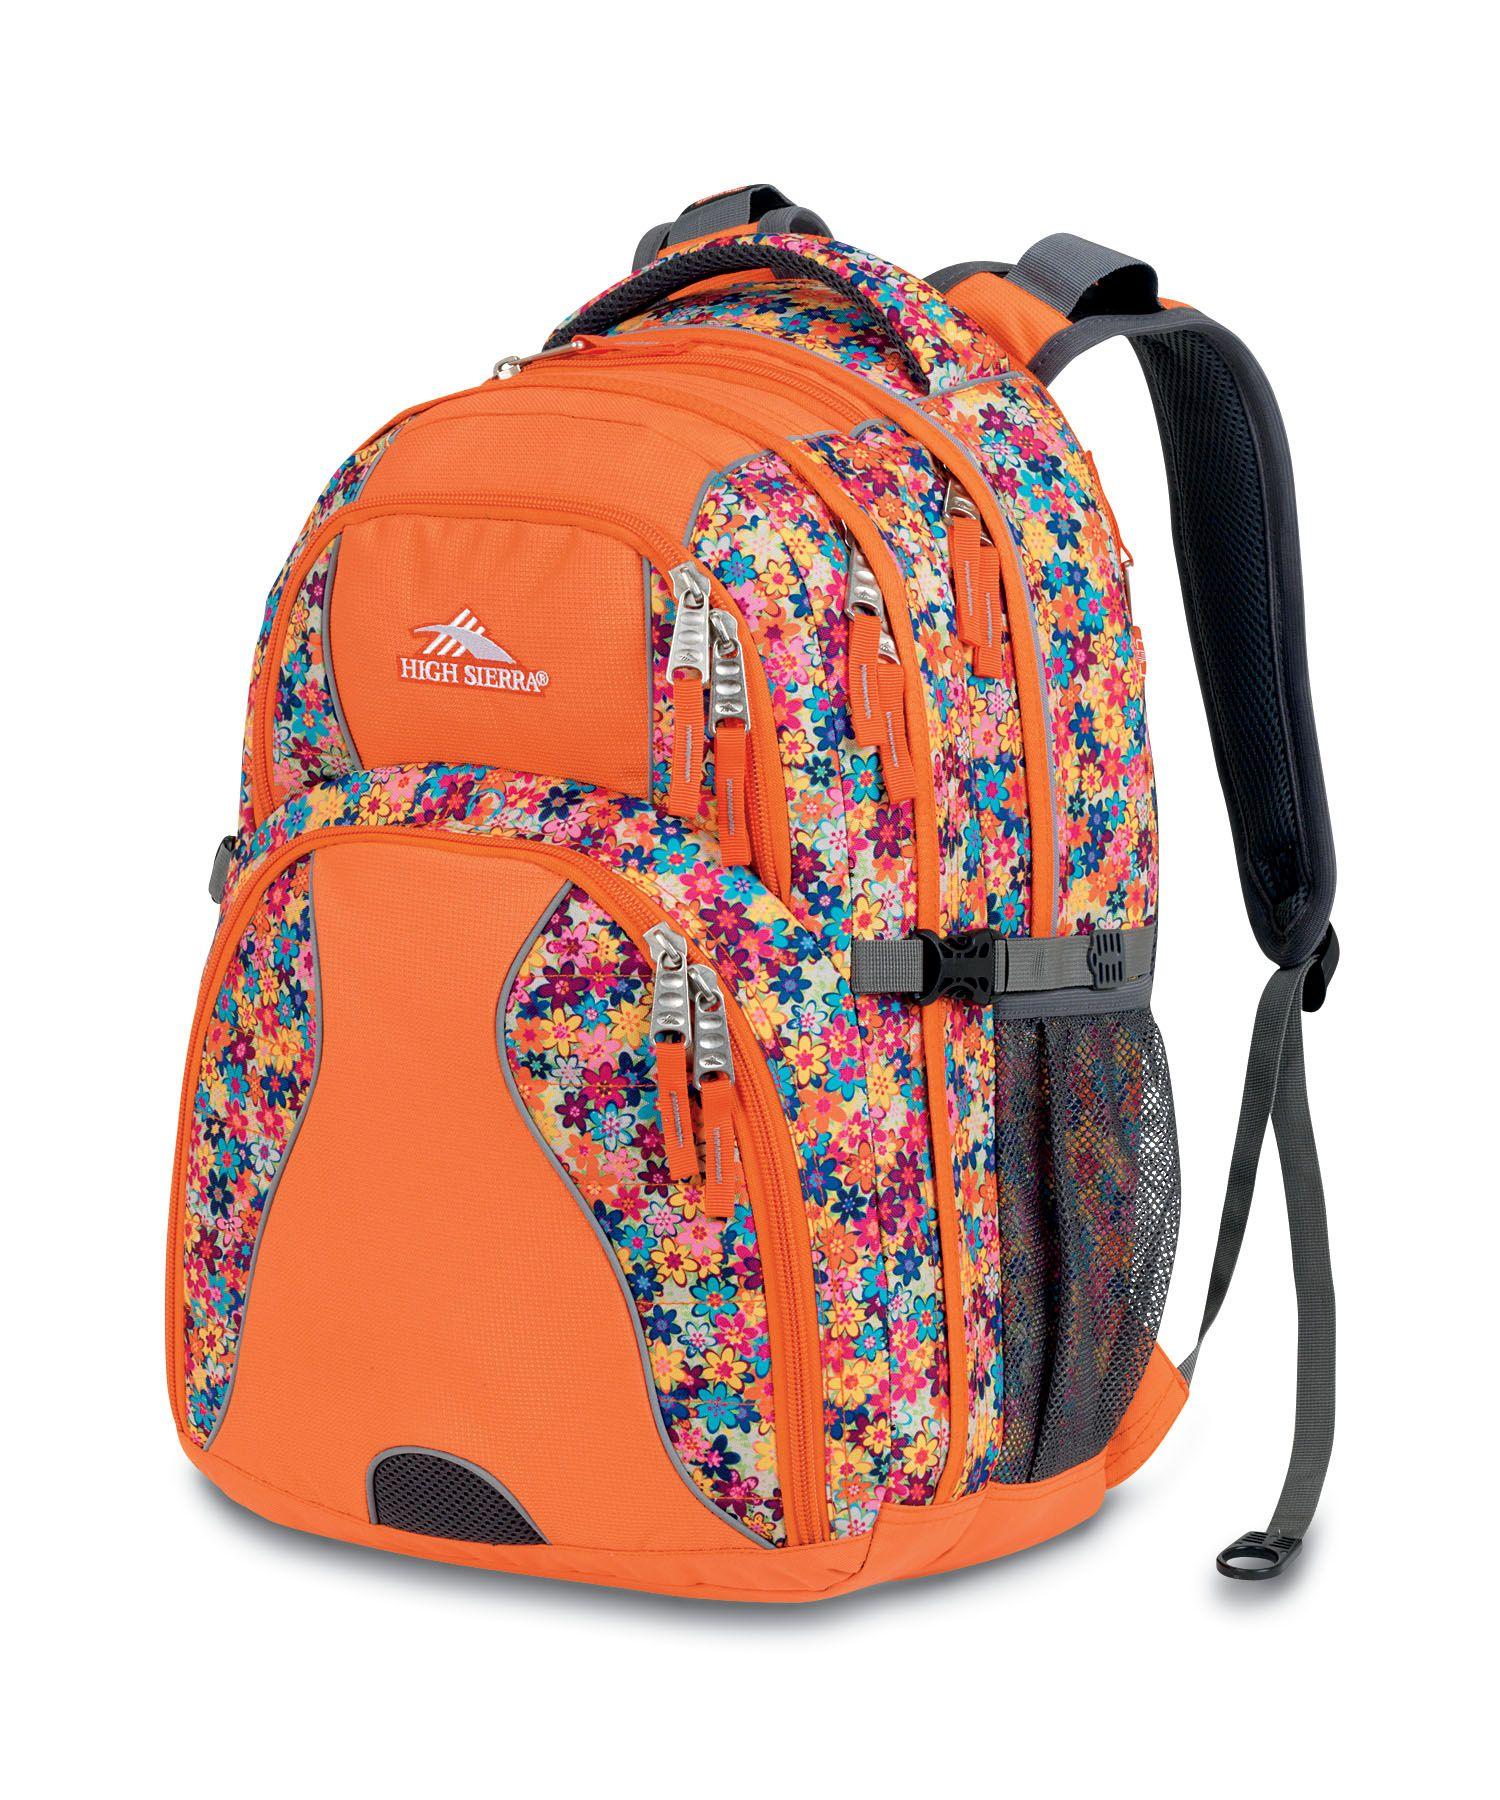 484639a99e9 High Sierra Swerve Backpack - Orange Computer Sleeve, Usb Hub, Laptop  Storage, Mp3